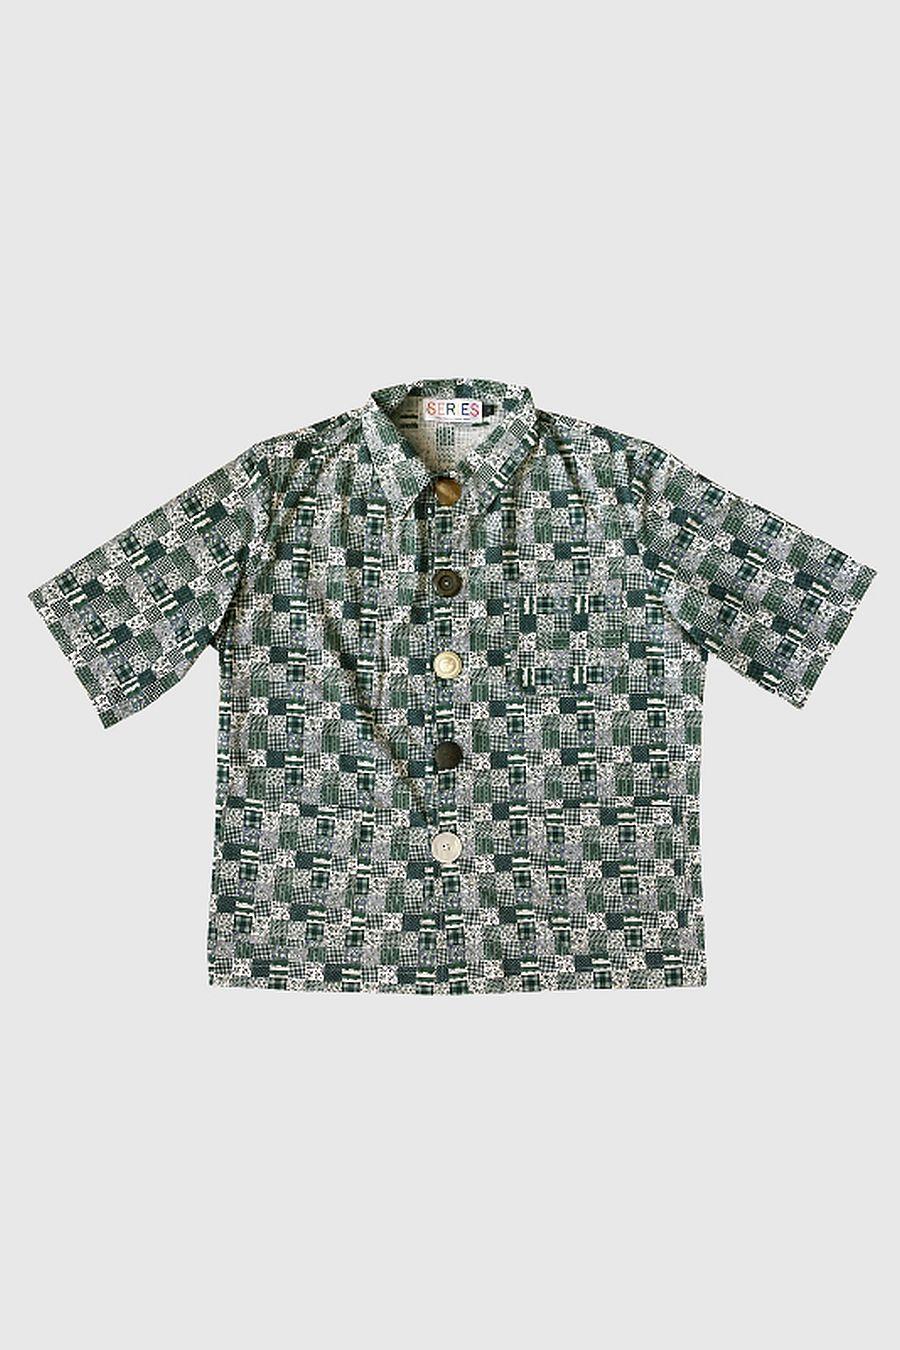 The Series NY Chore Shirt - CSCH003